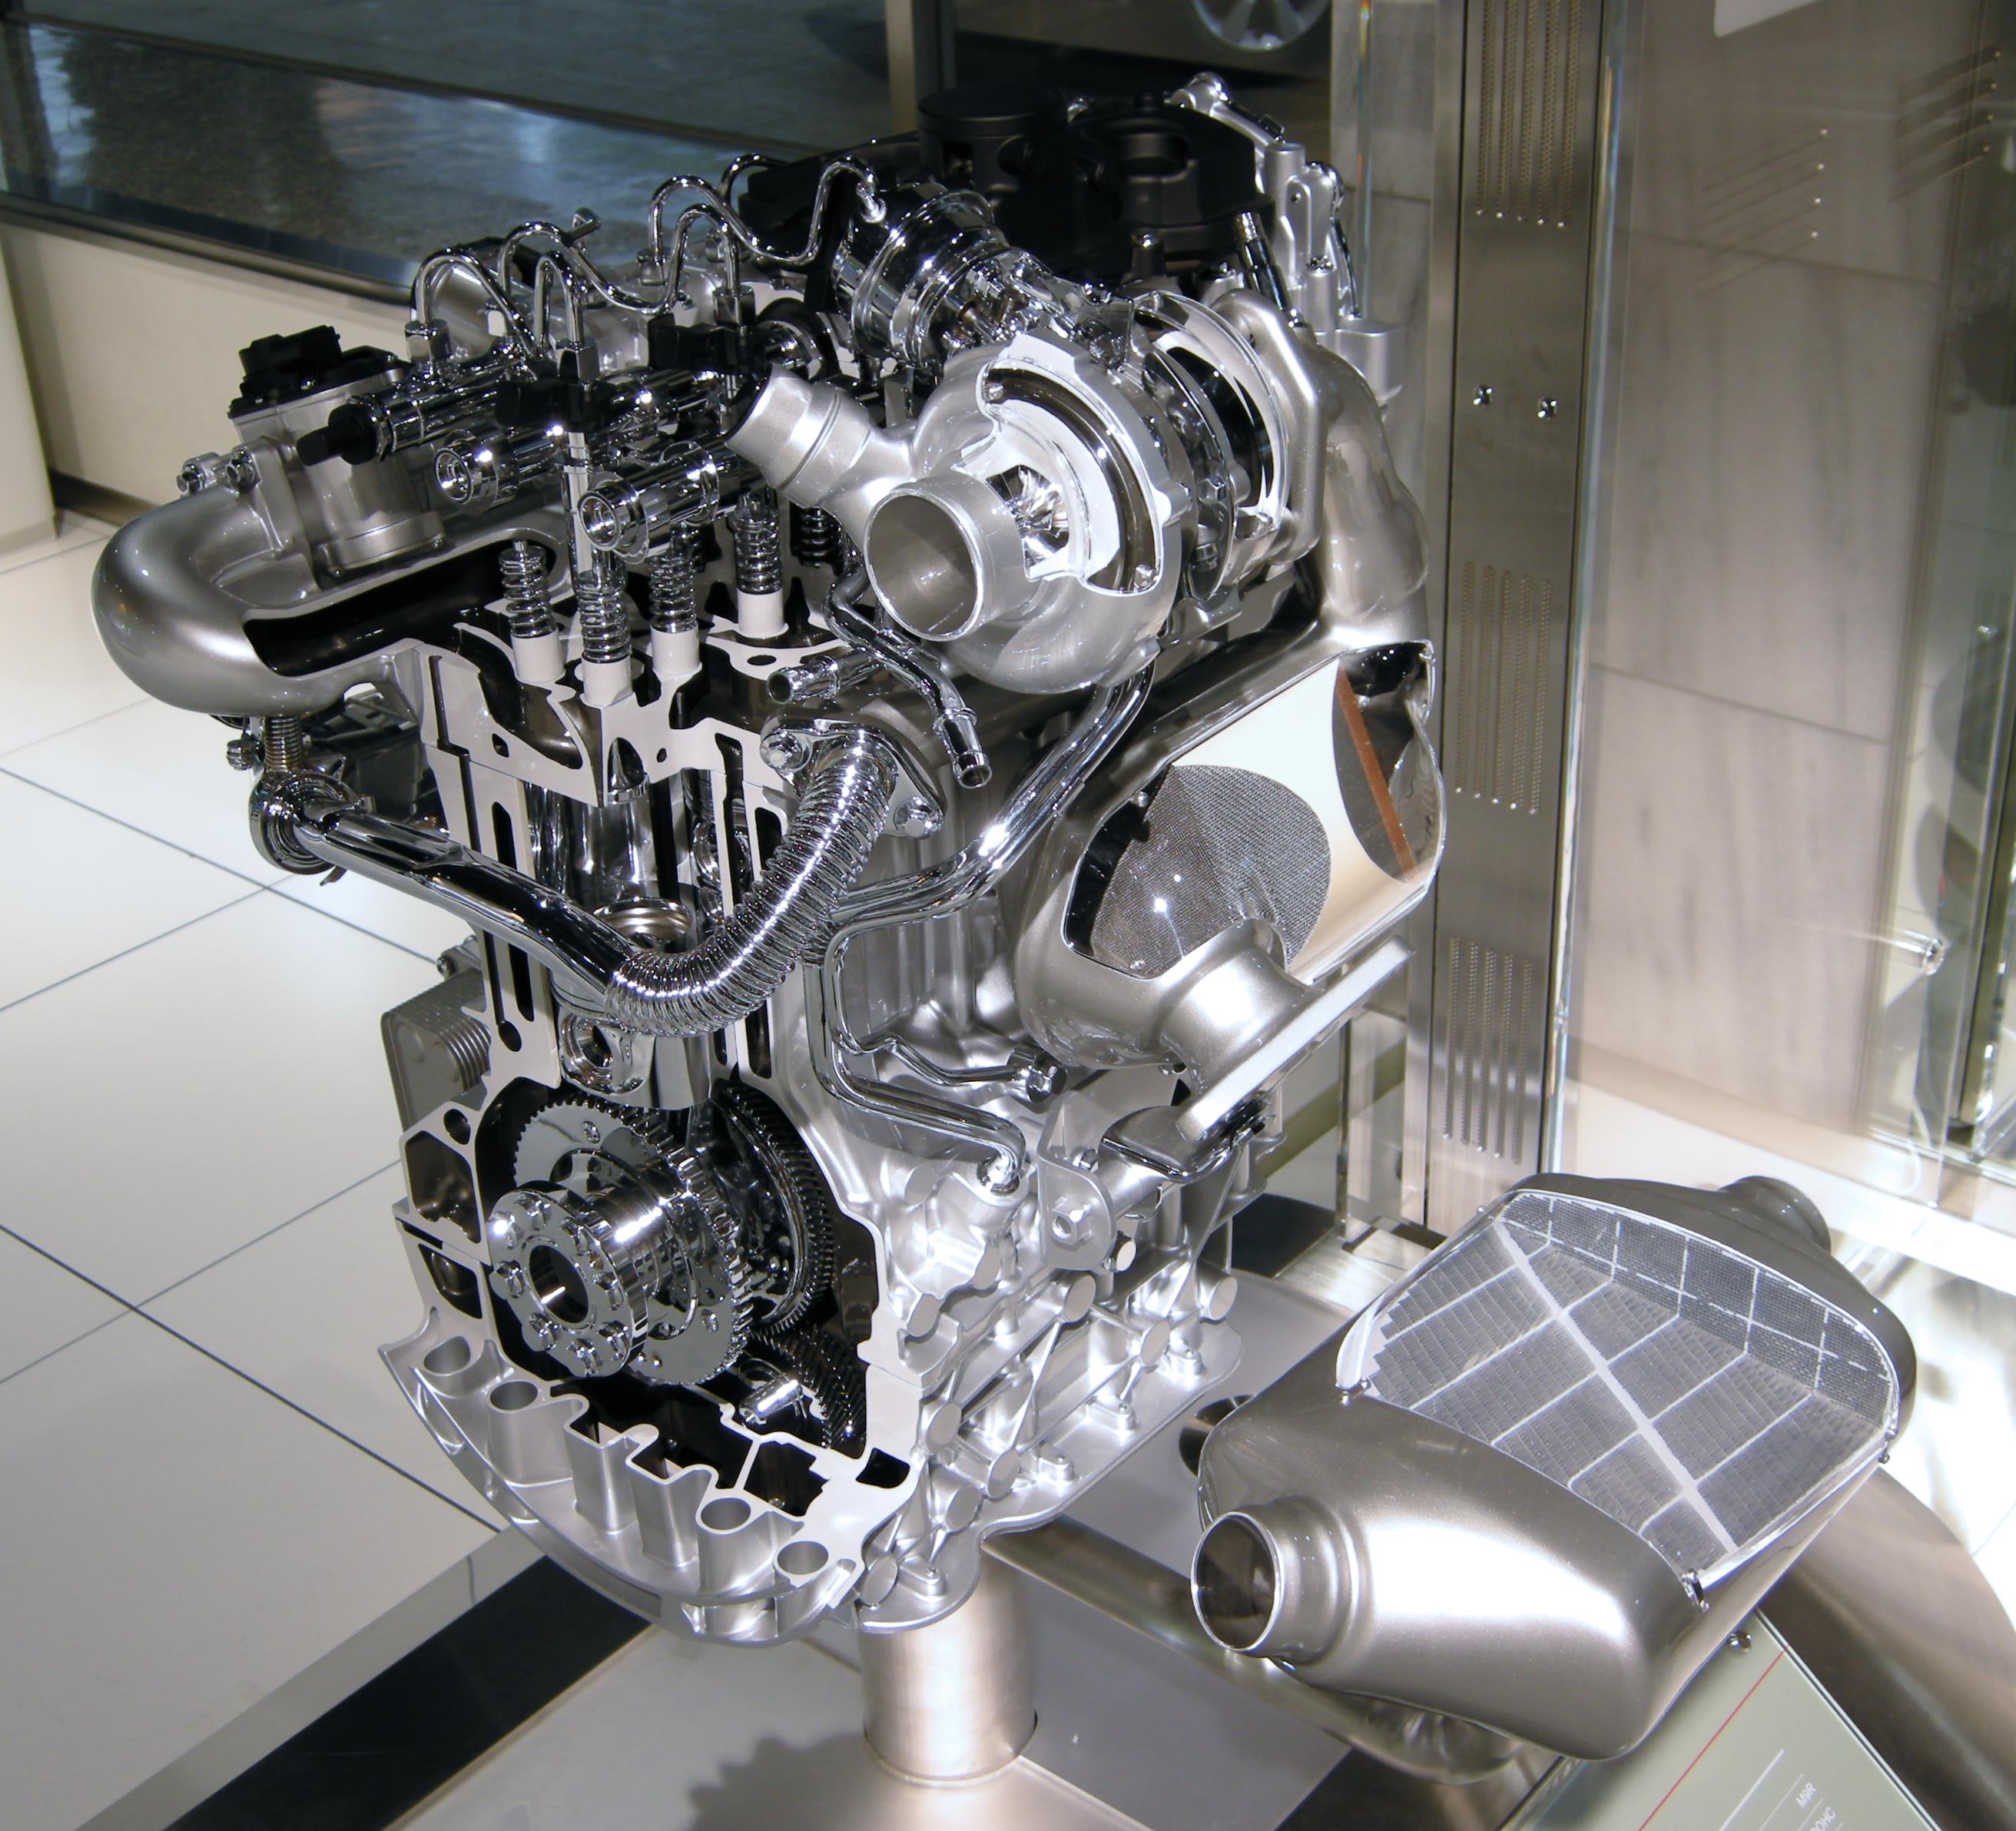 2002 Nissan Sentra Replacement Engine Parts – CARiD.com